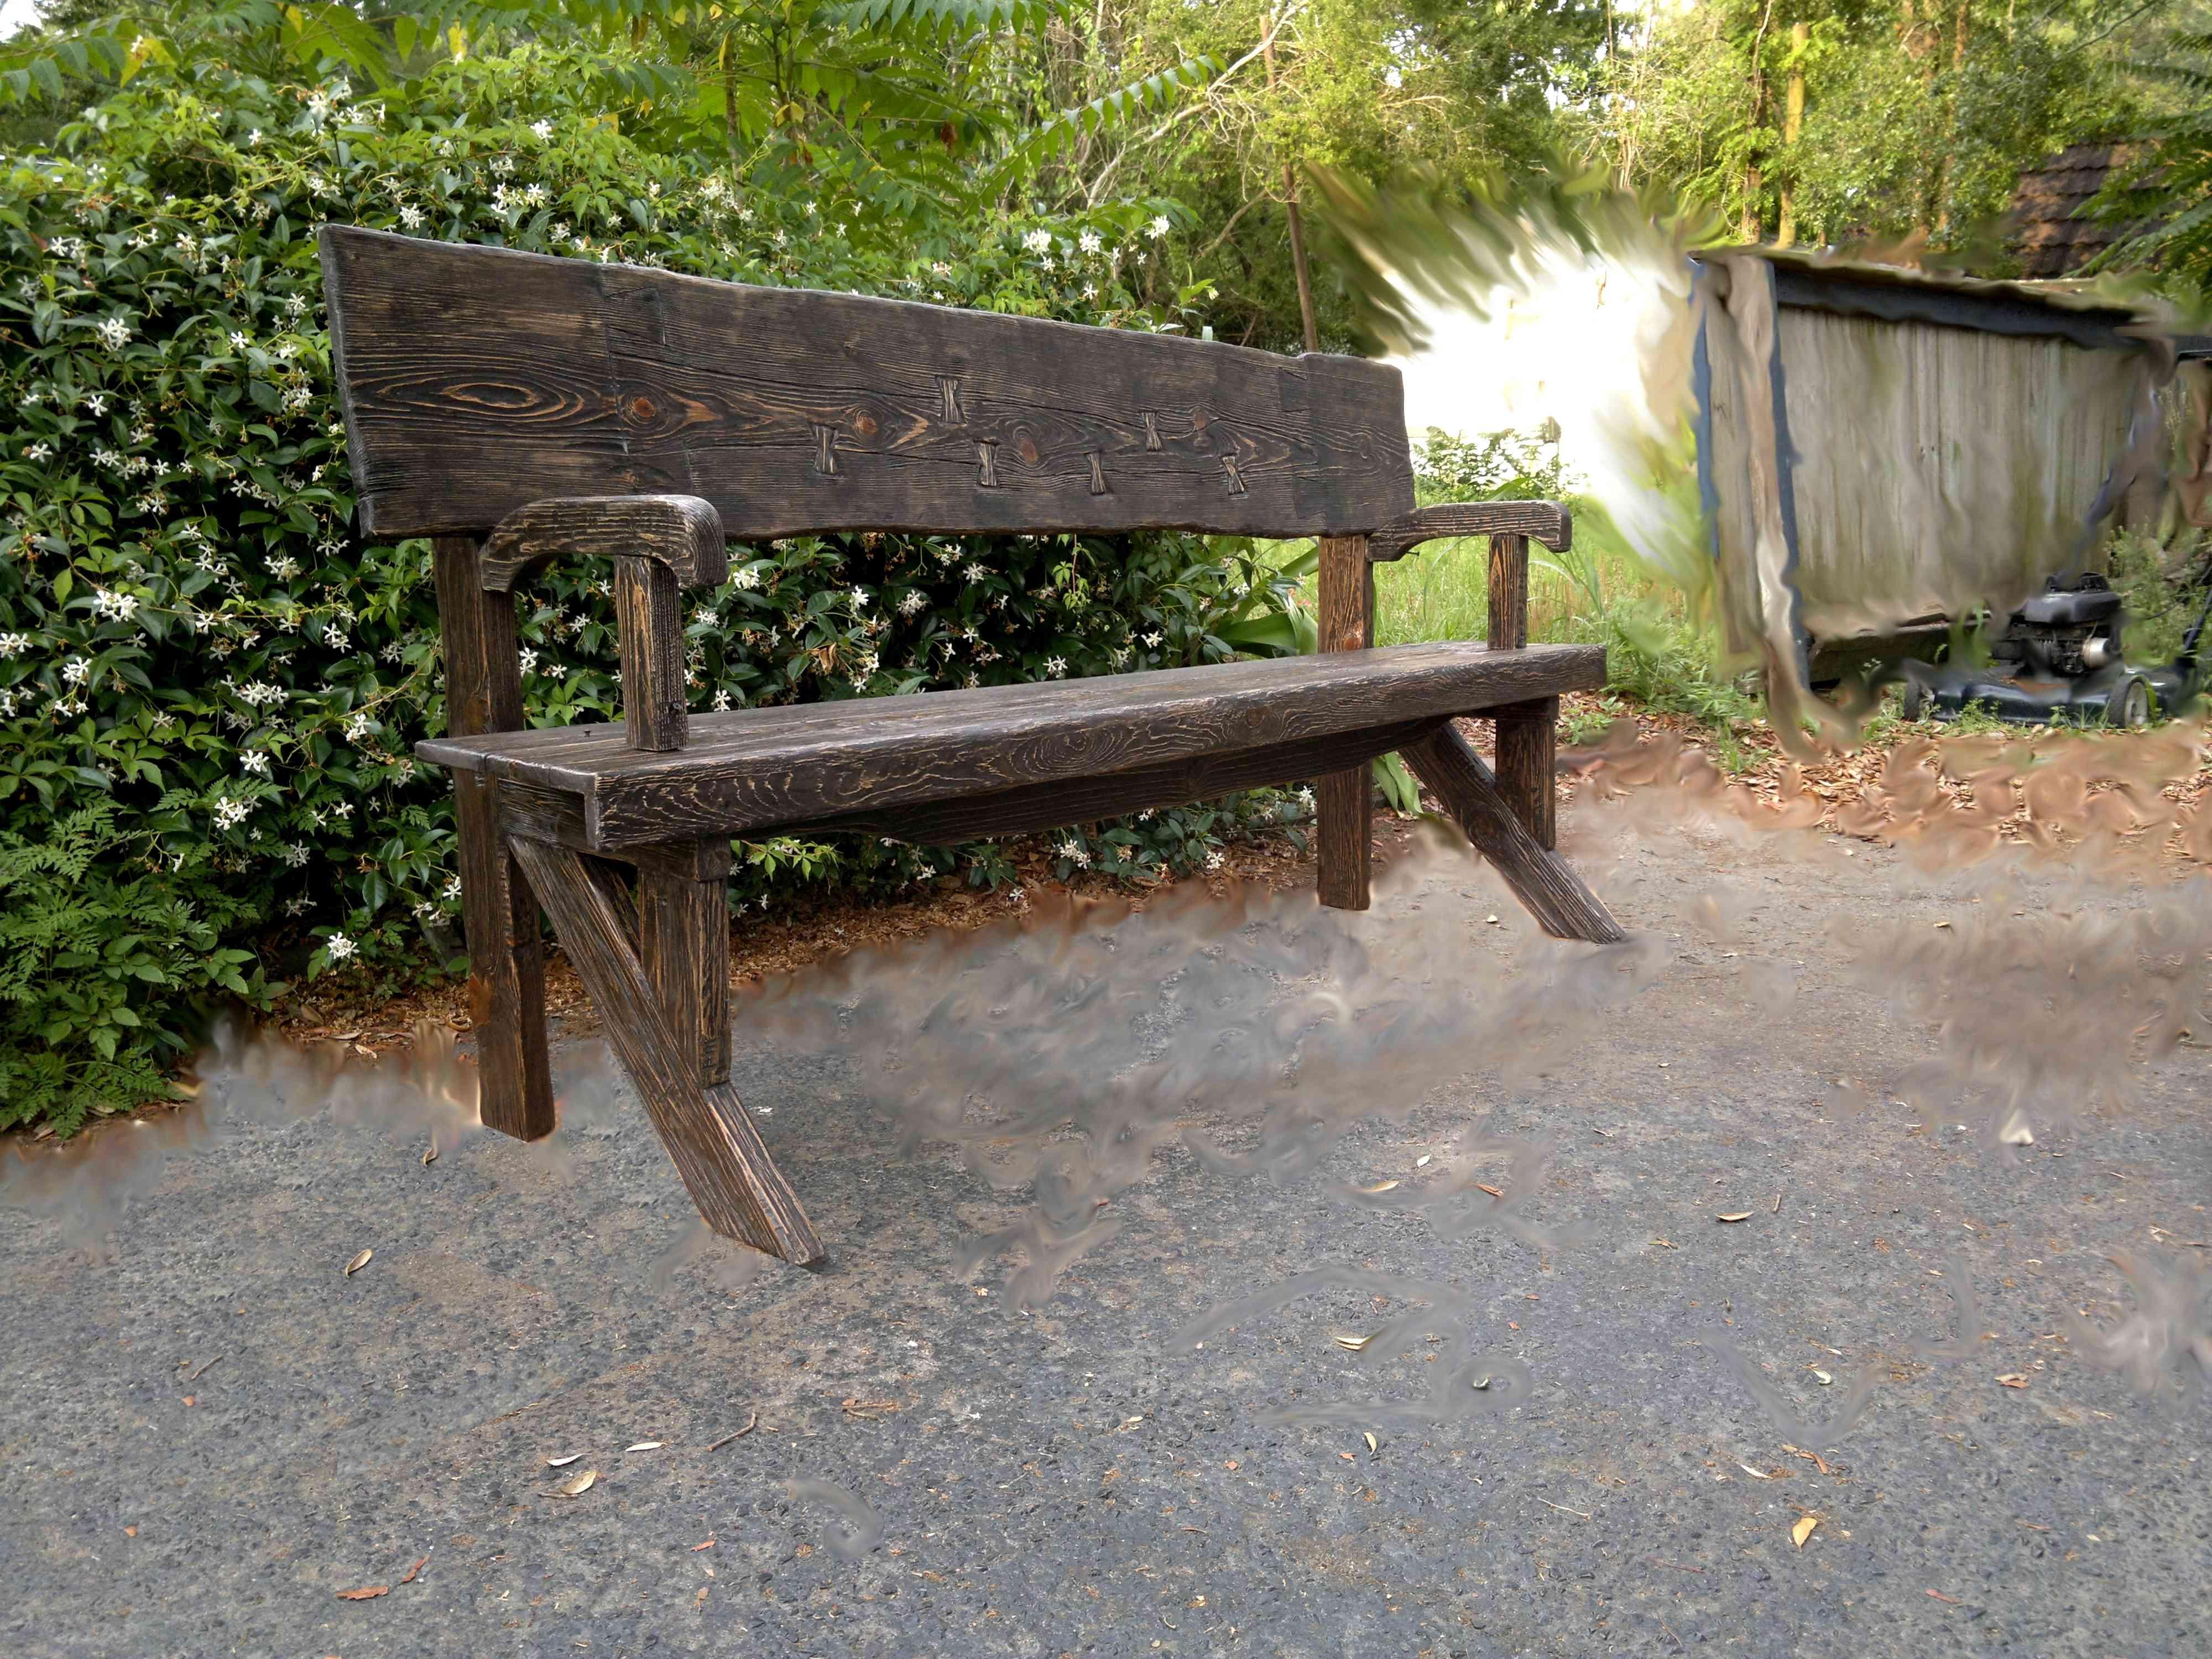 Rustic bench. Detail